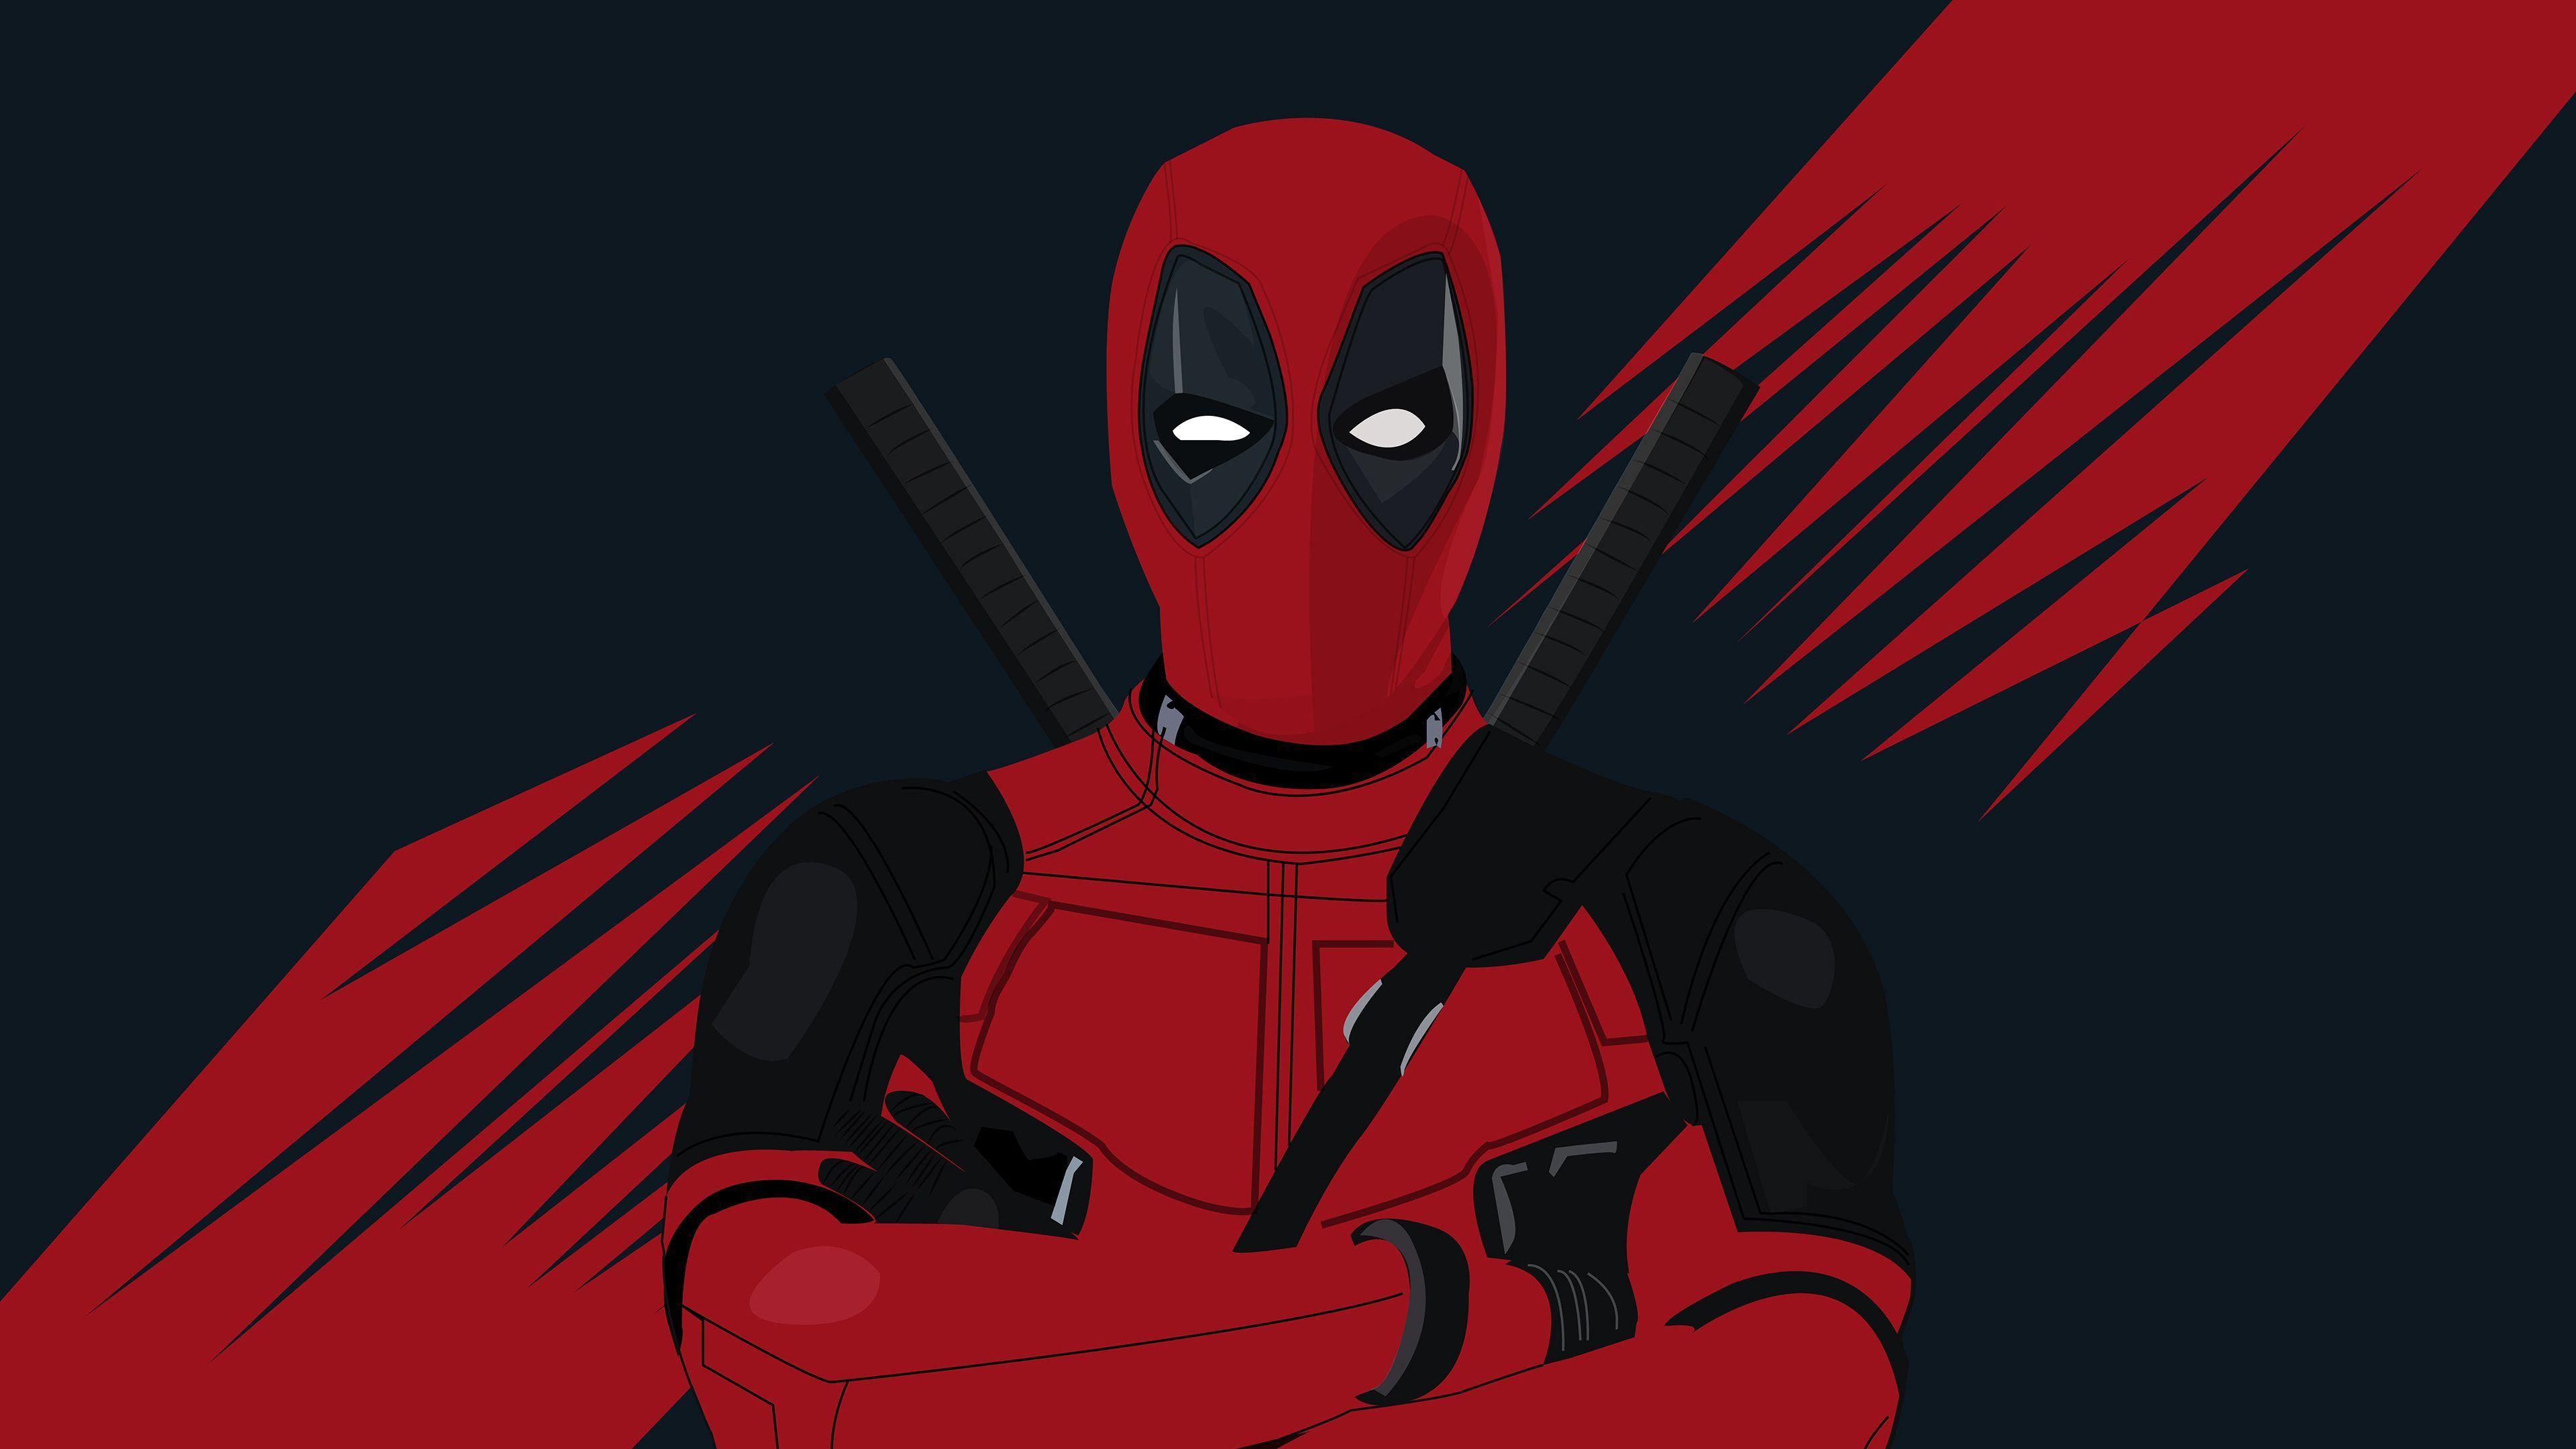 4k Deadpool Desktop Wallpapers Wallpaper Cave